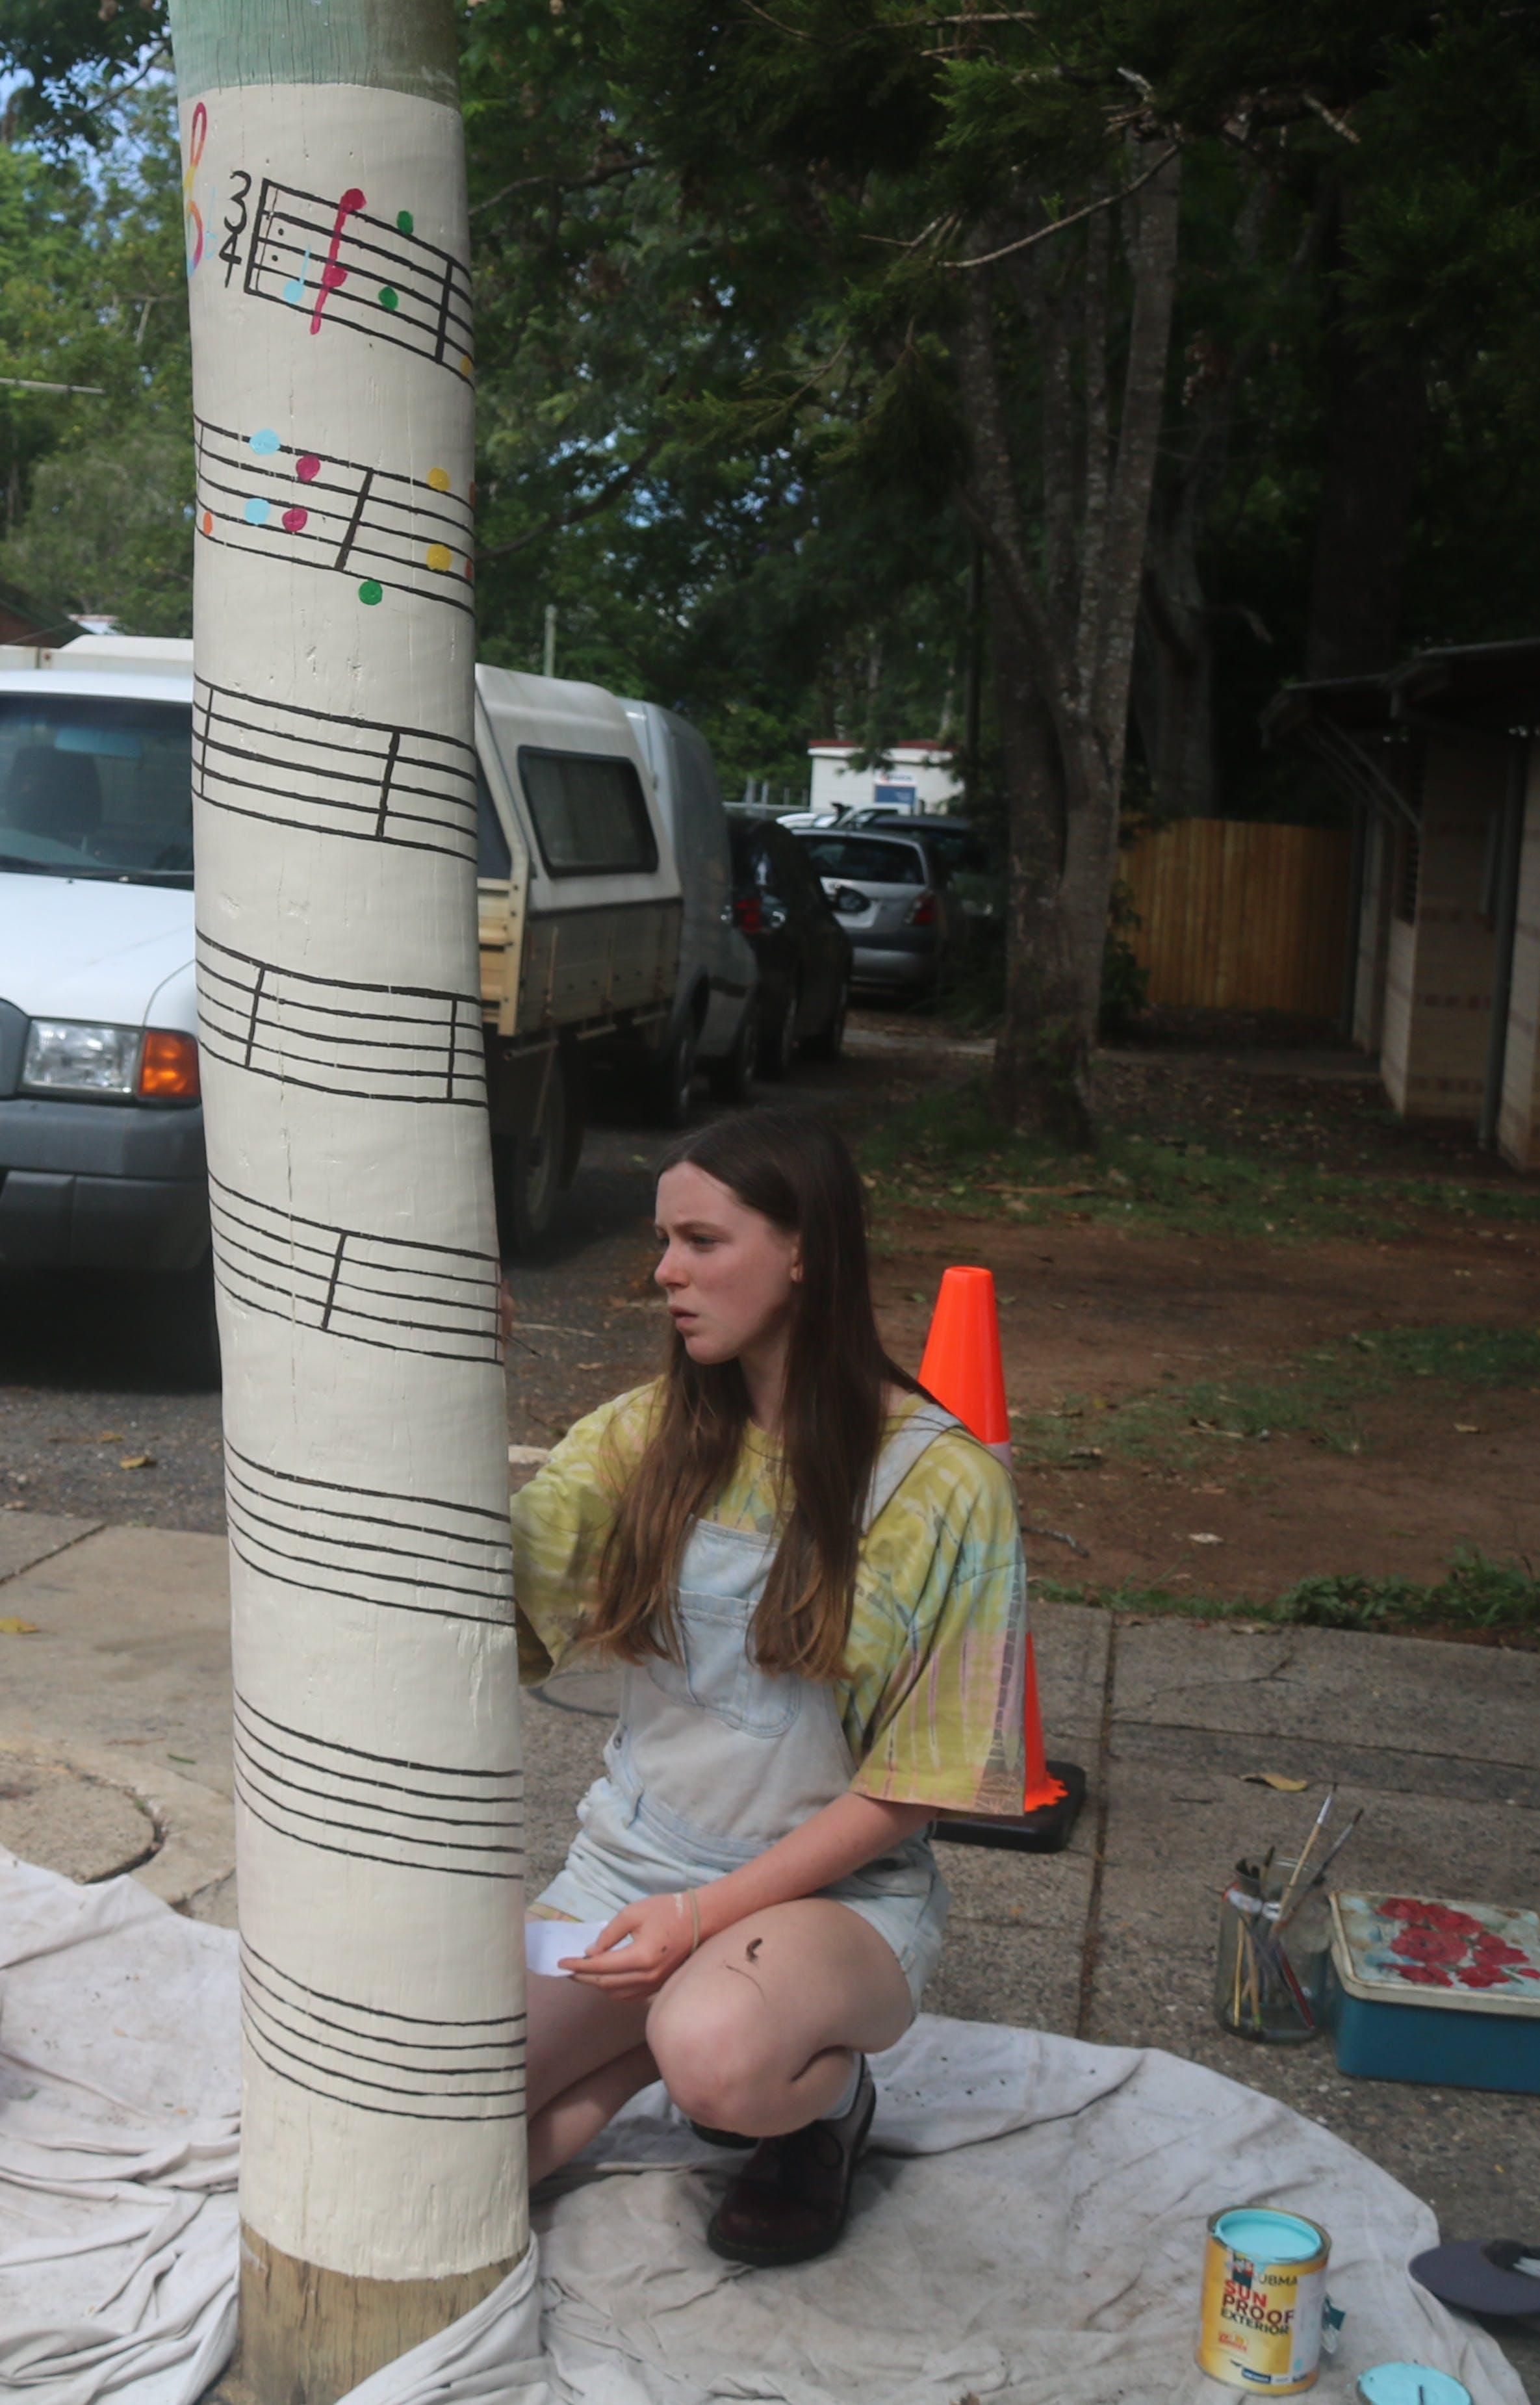 Pilot Pole Painting in Progress